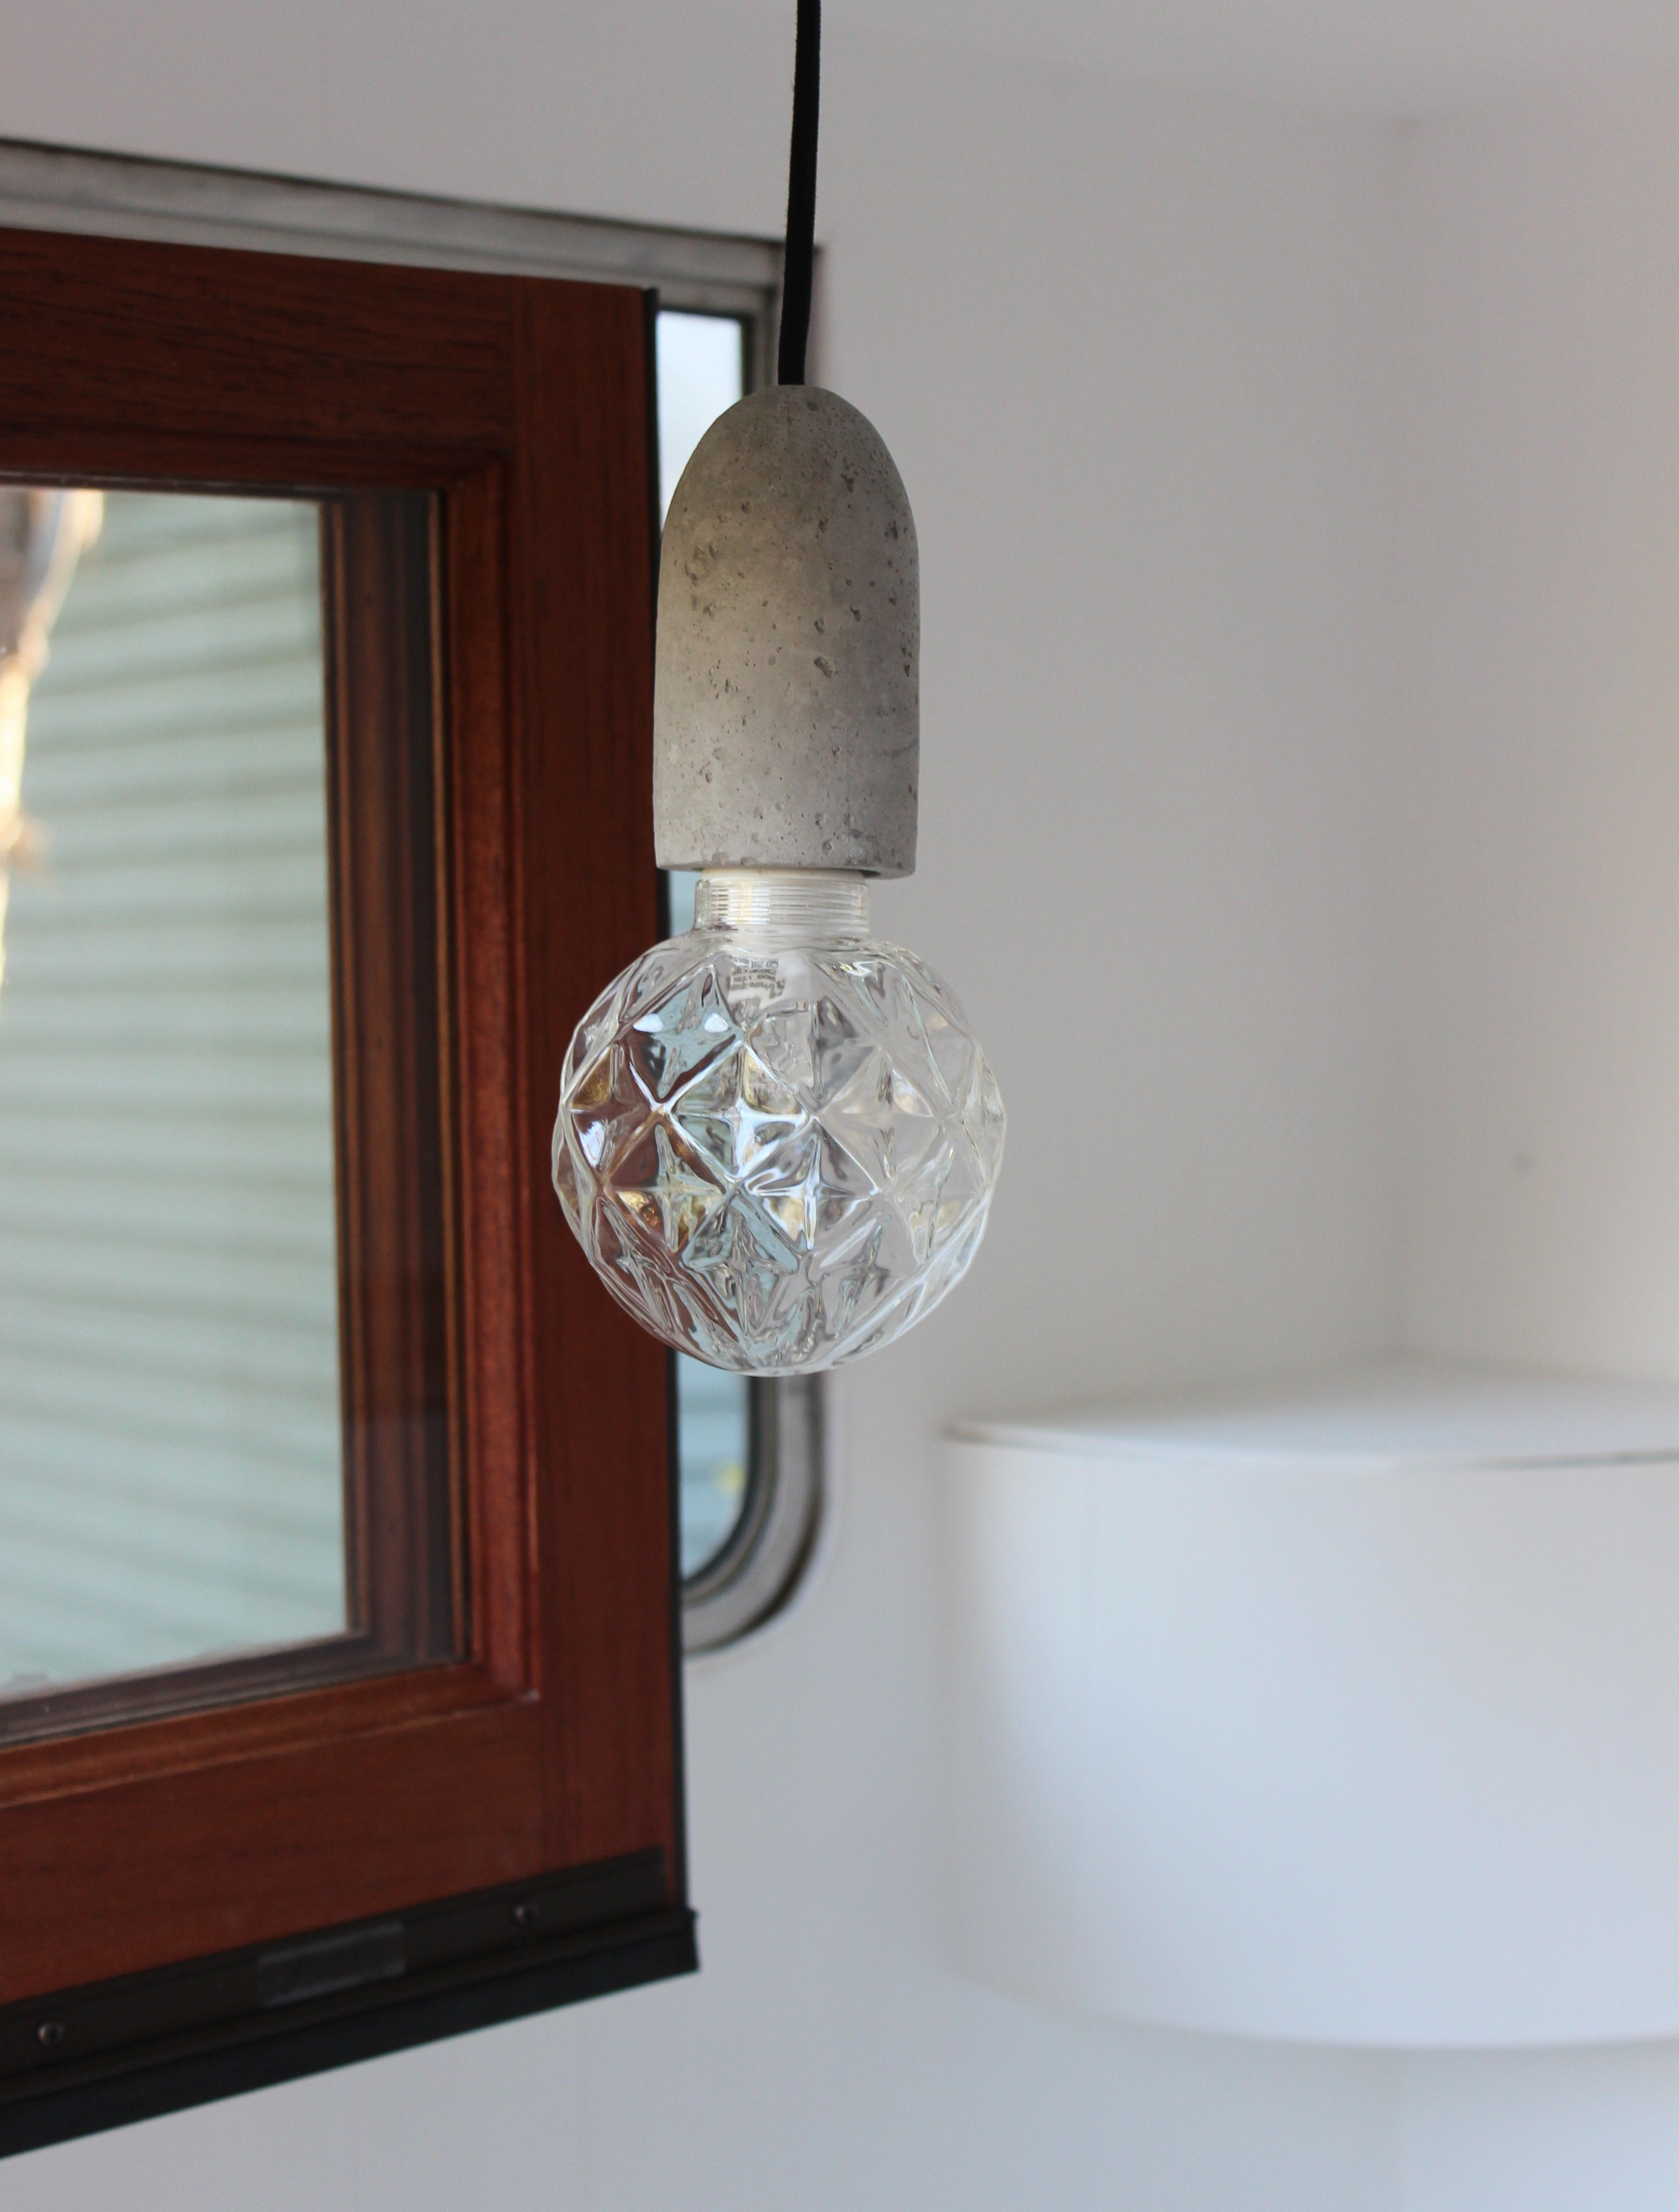 new pendant lighting. My Vintage Caravan Makeover - New Concrete Pendant Lights Lighting